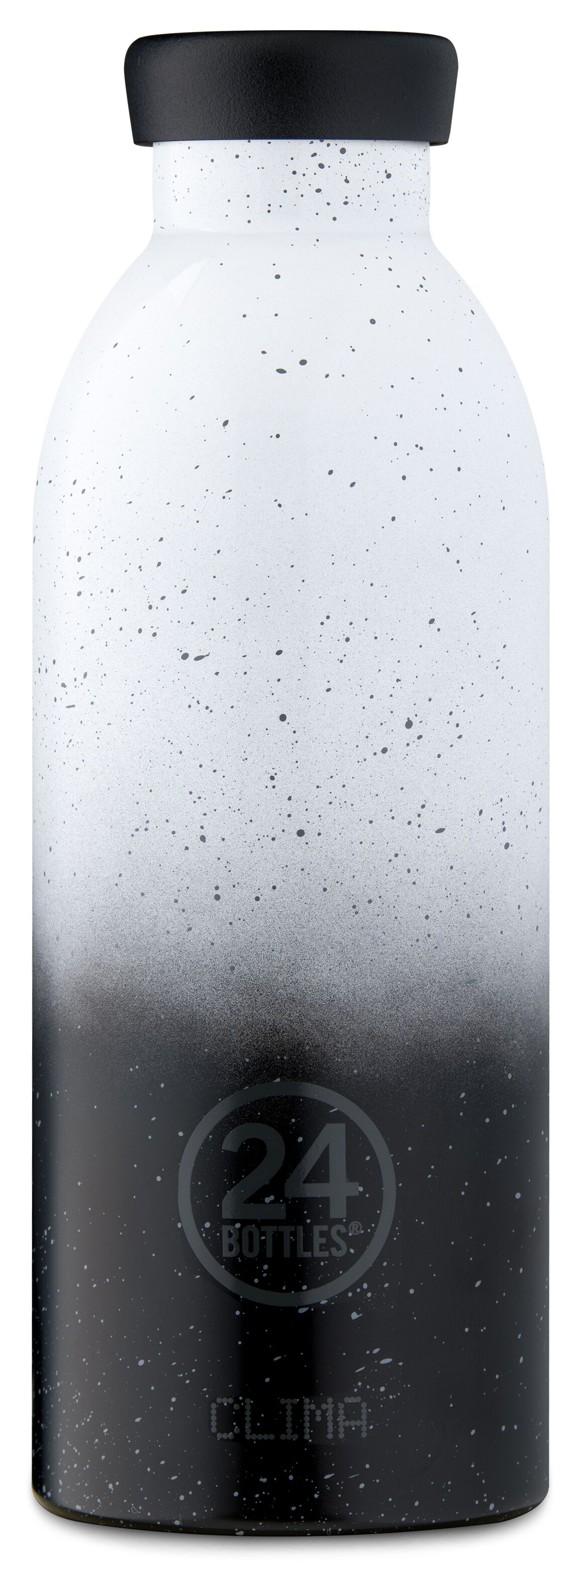 24 Bottles - Clime Bottle 0,5 L - Eclipse